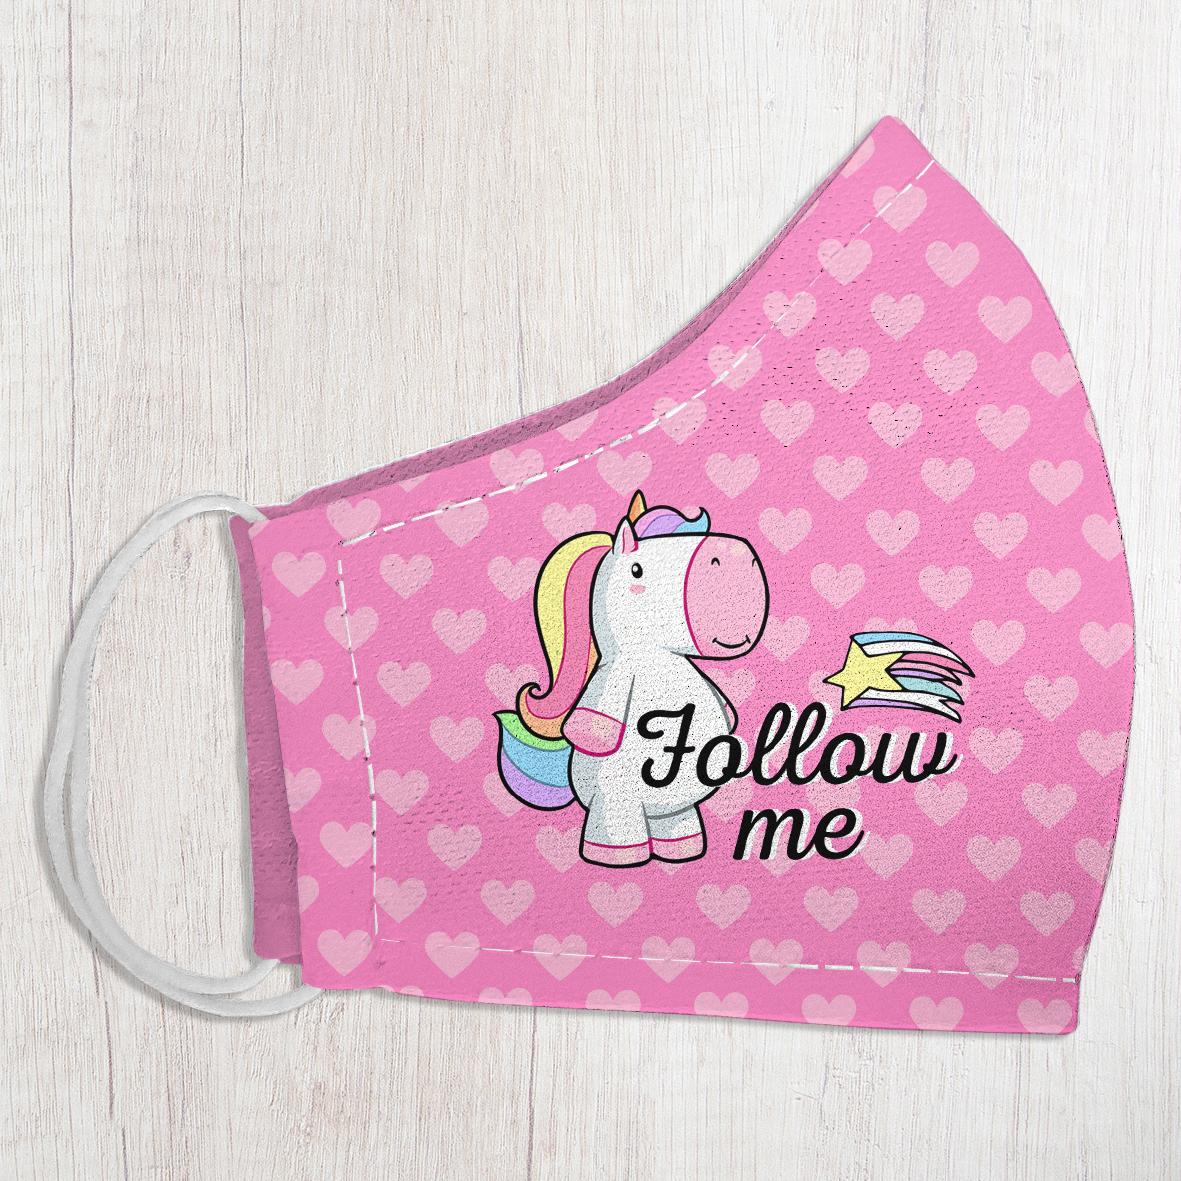 Маска защитная для лица, размер S-M Follow me (единорог)